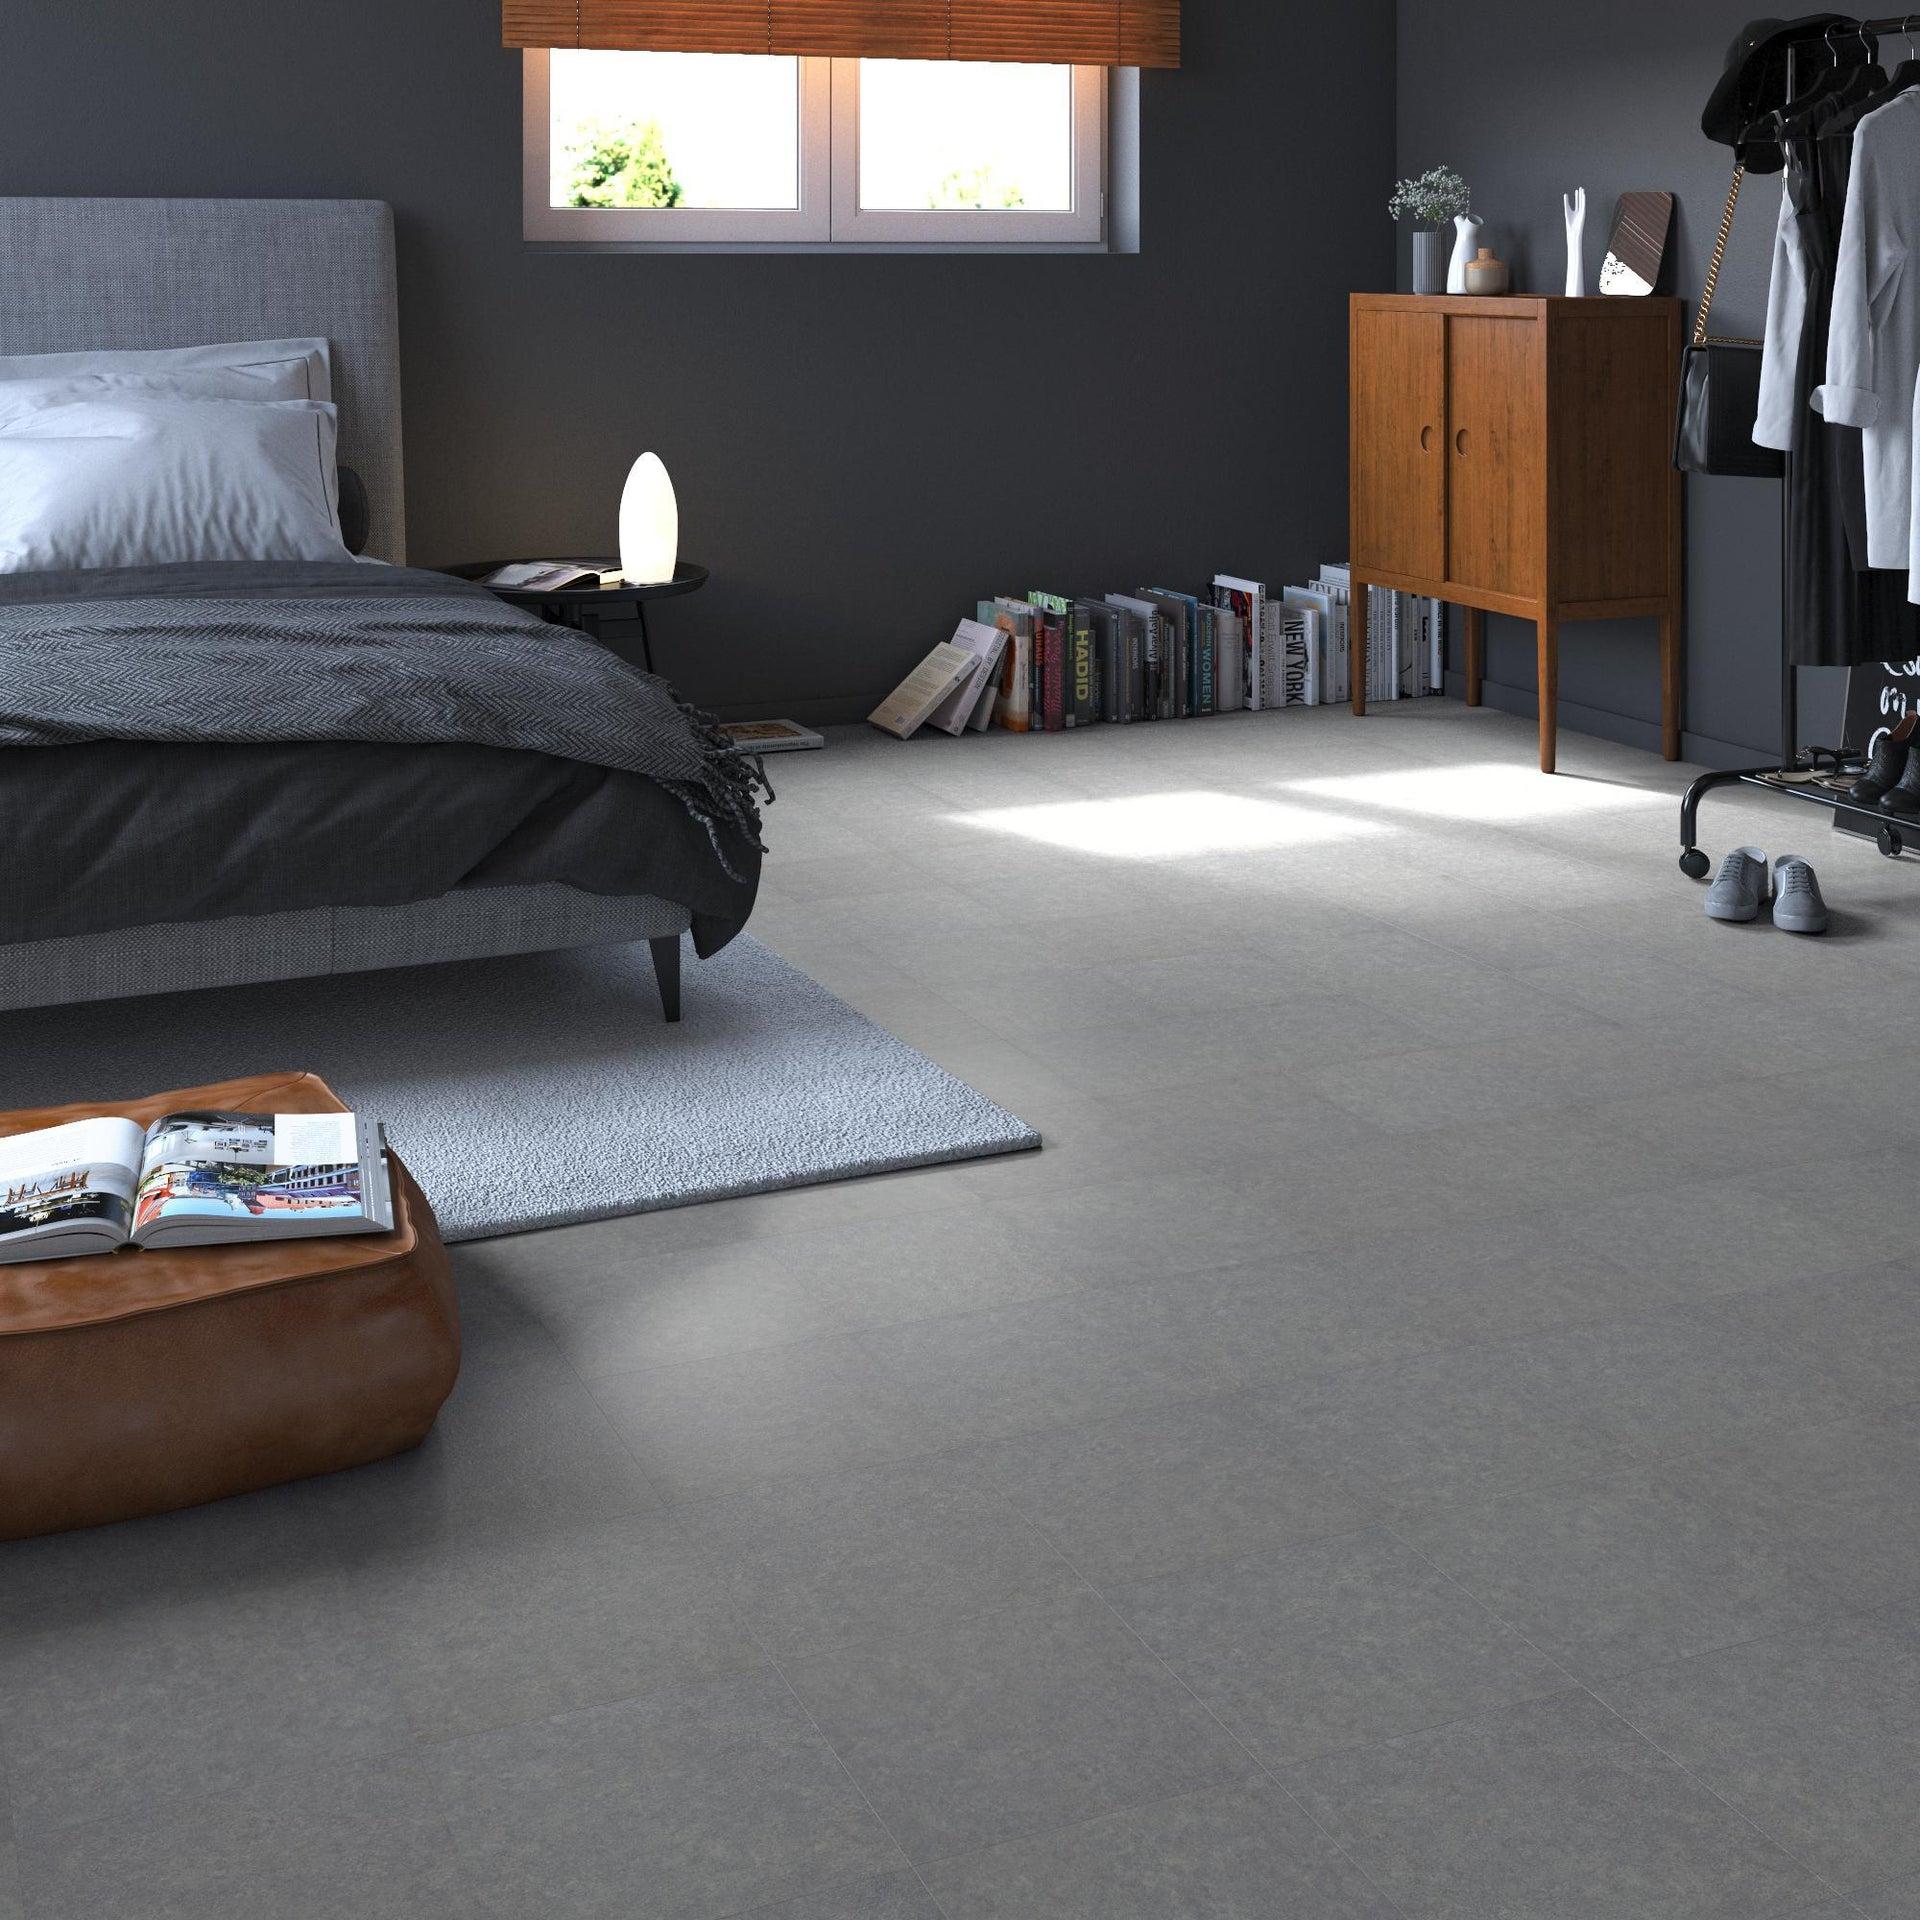 Pavimento PVC adesivo Kamet Sp 1.2 mm grigio / argento - 1